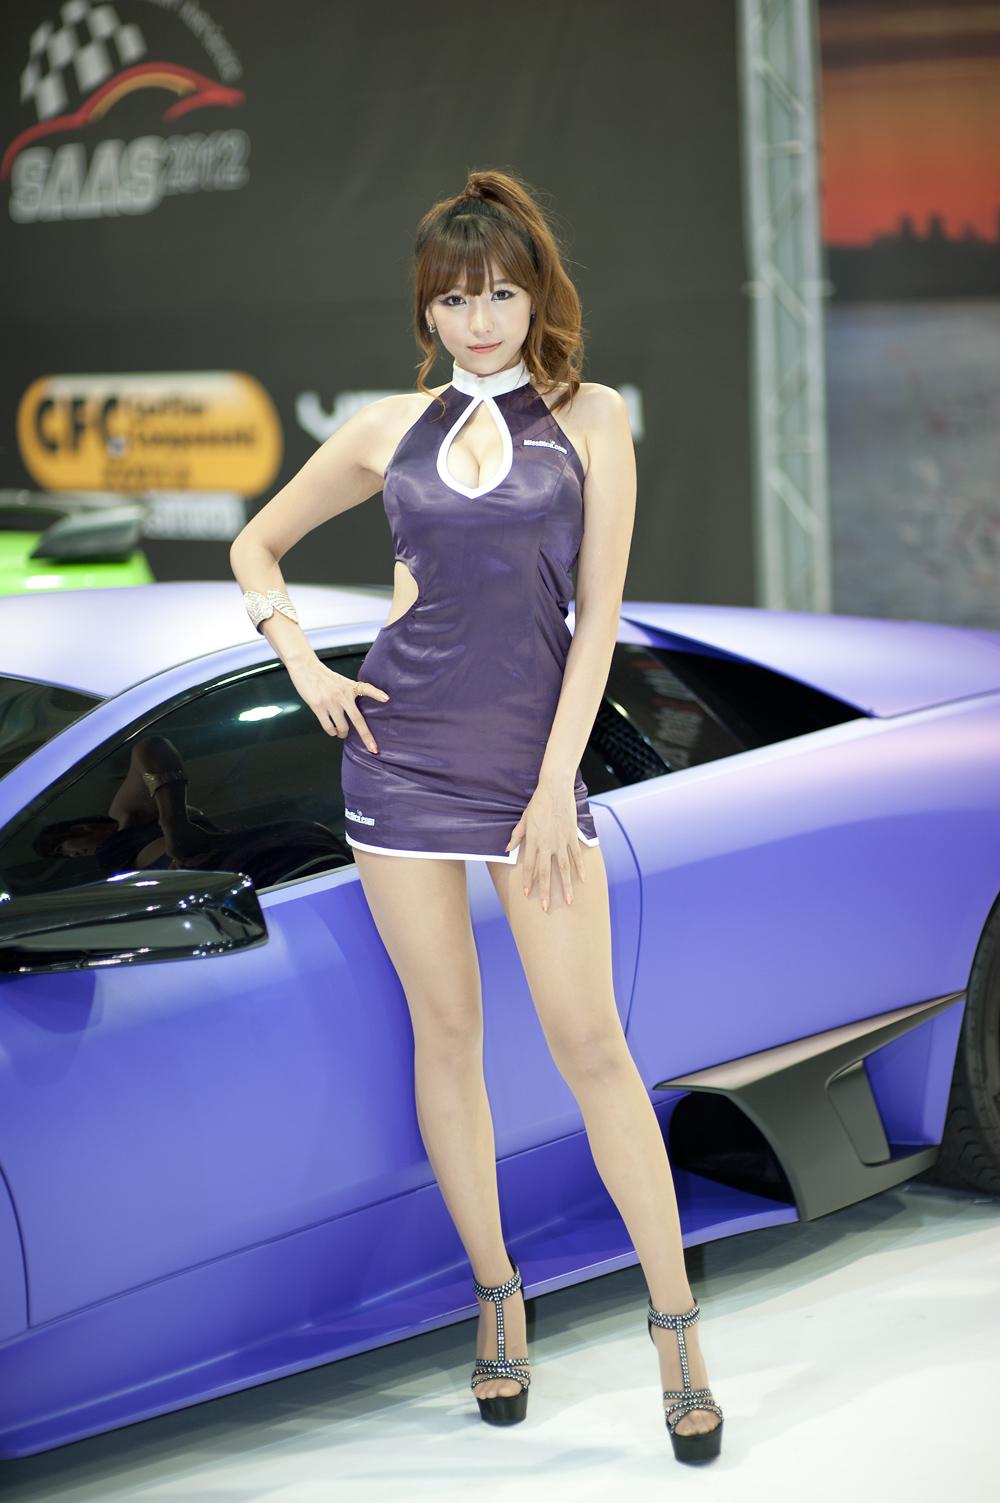 xxx nude girls: Lee Eun Hye - Seoul Auto Salon 2012